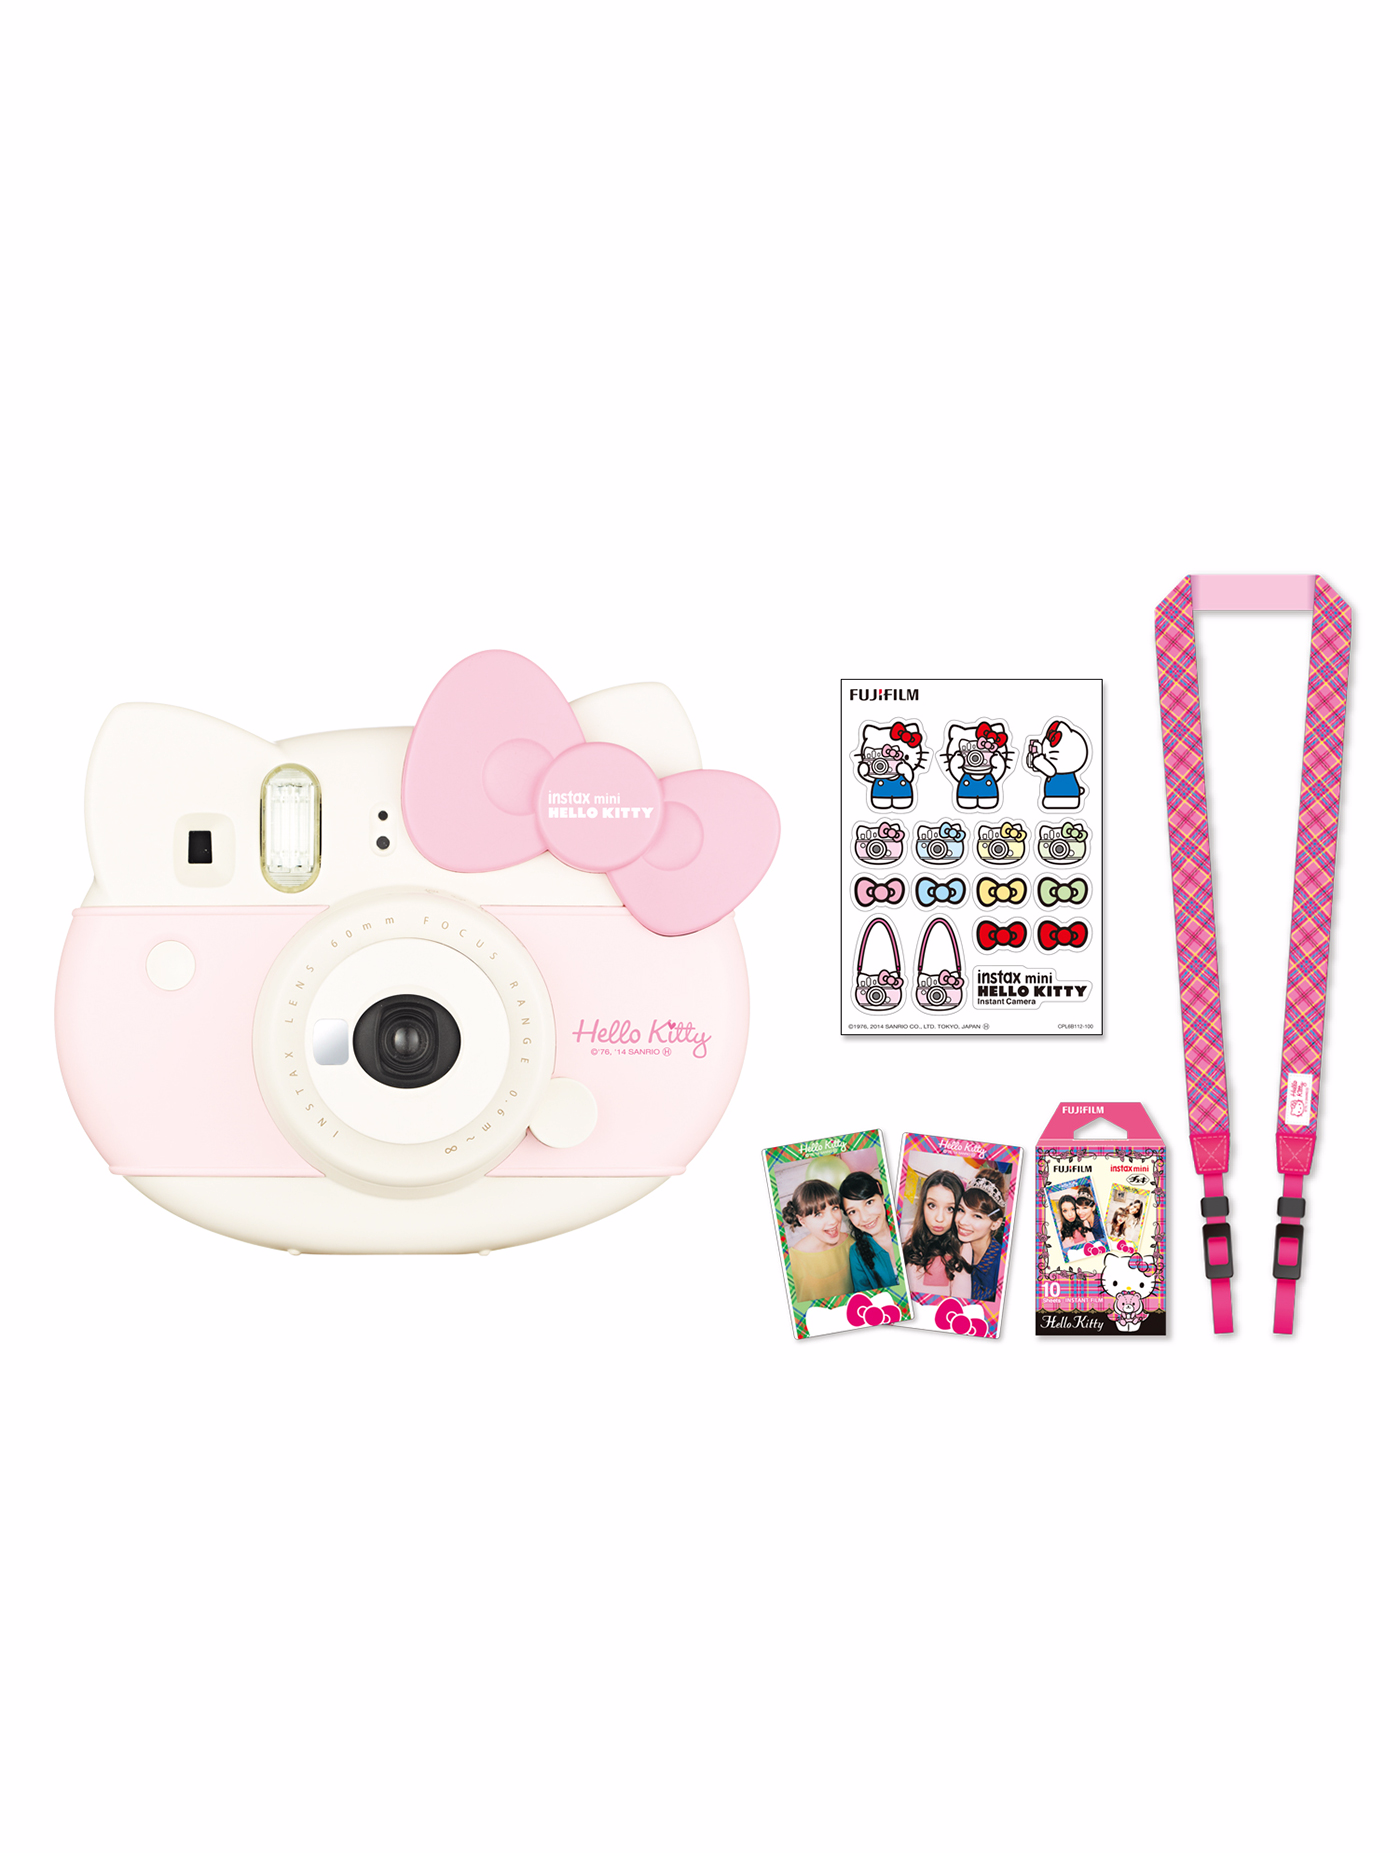 FUJIFILM กล้องโพลารอยด์ รุ่น Instax Mini Hello Kitty